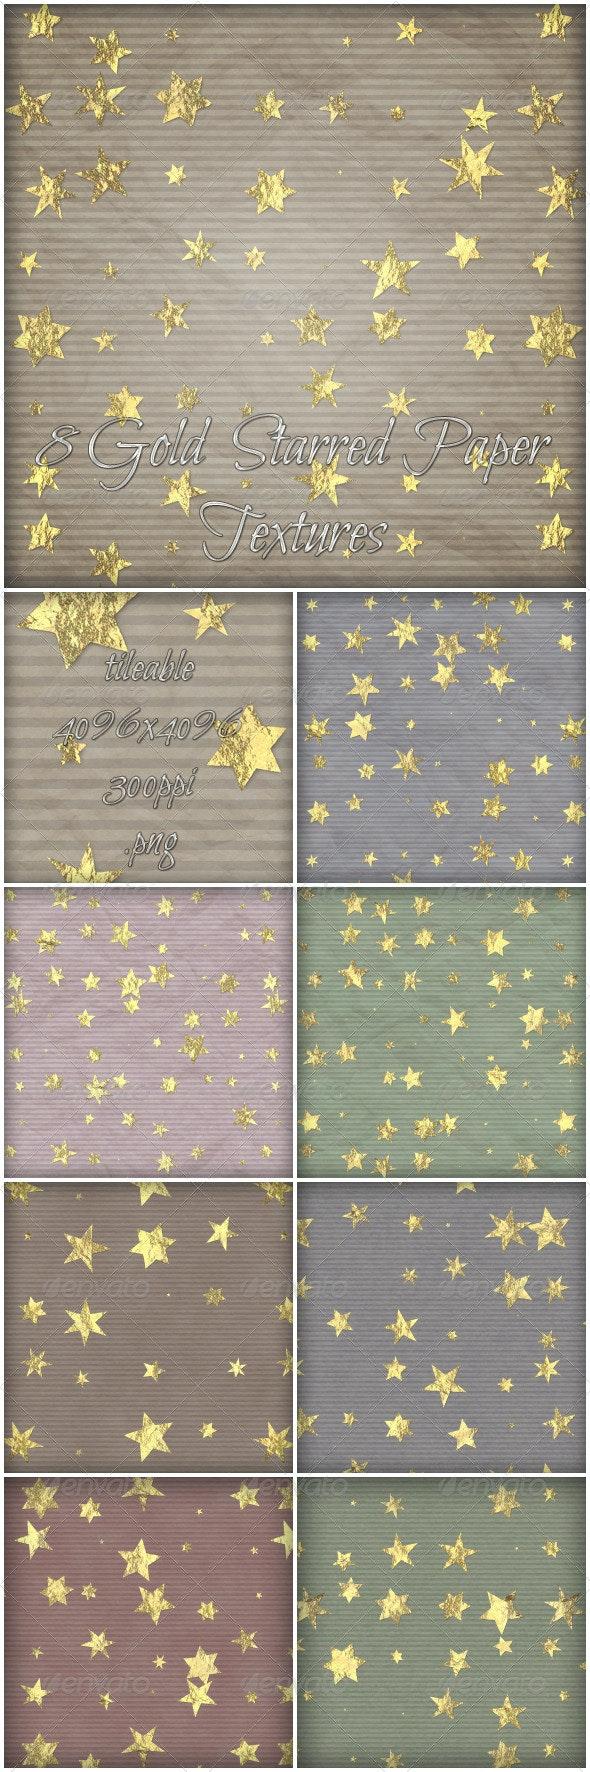 8 Gold starred Paper Textures - Paper Textures